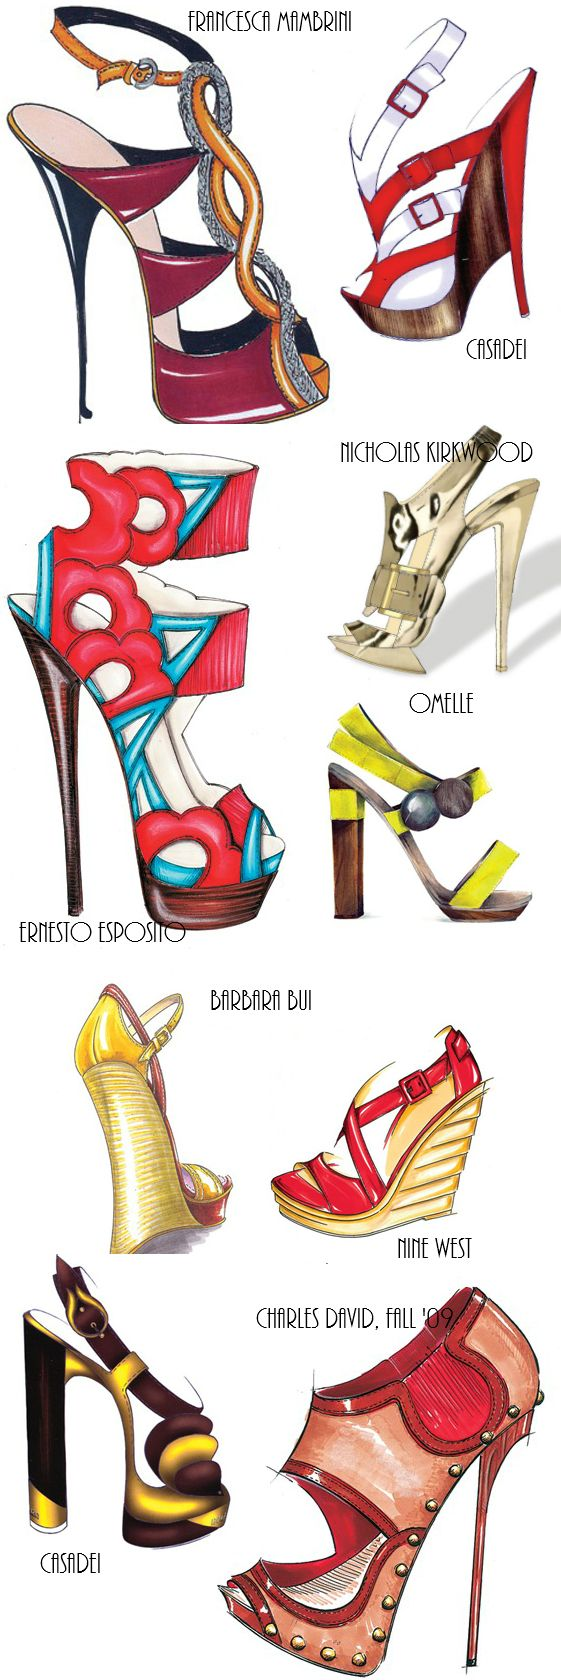 Heels clipart fashion illustration Shoe Caravan: Pinterest ✵Wheel on